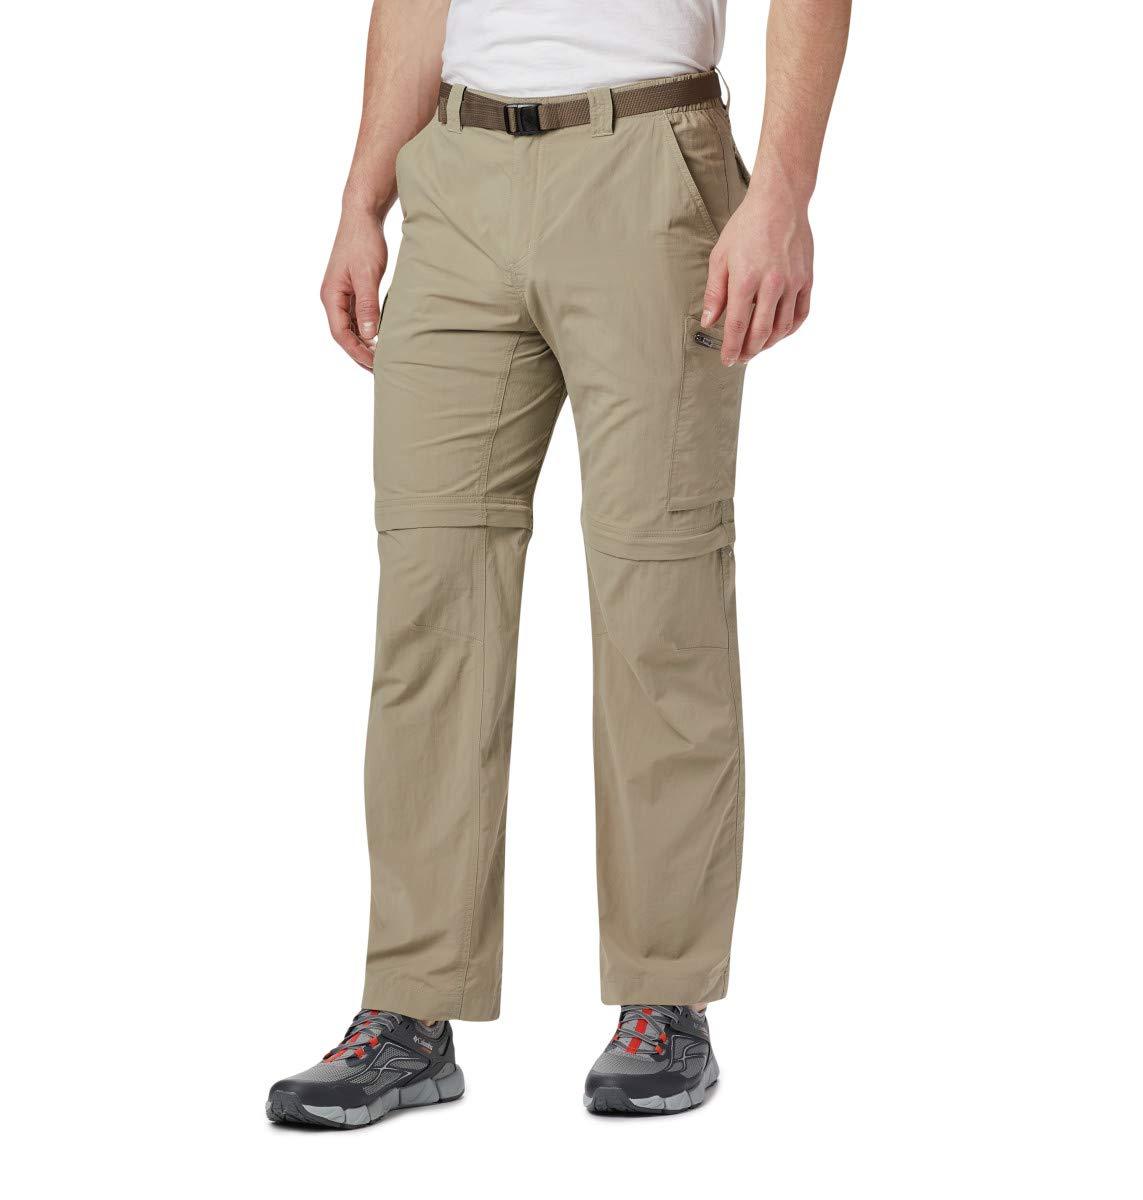 Columbia Men's Silver Ridge Convertible Pant, Tusk, 42 x 34